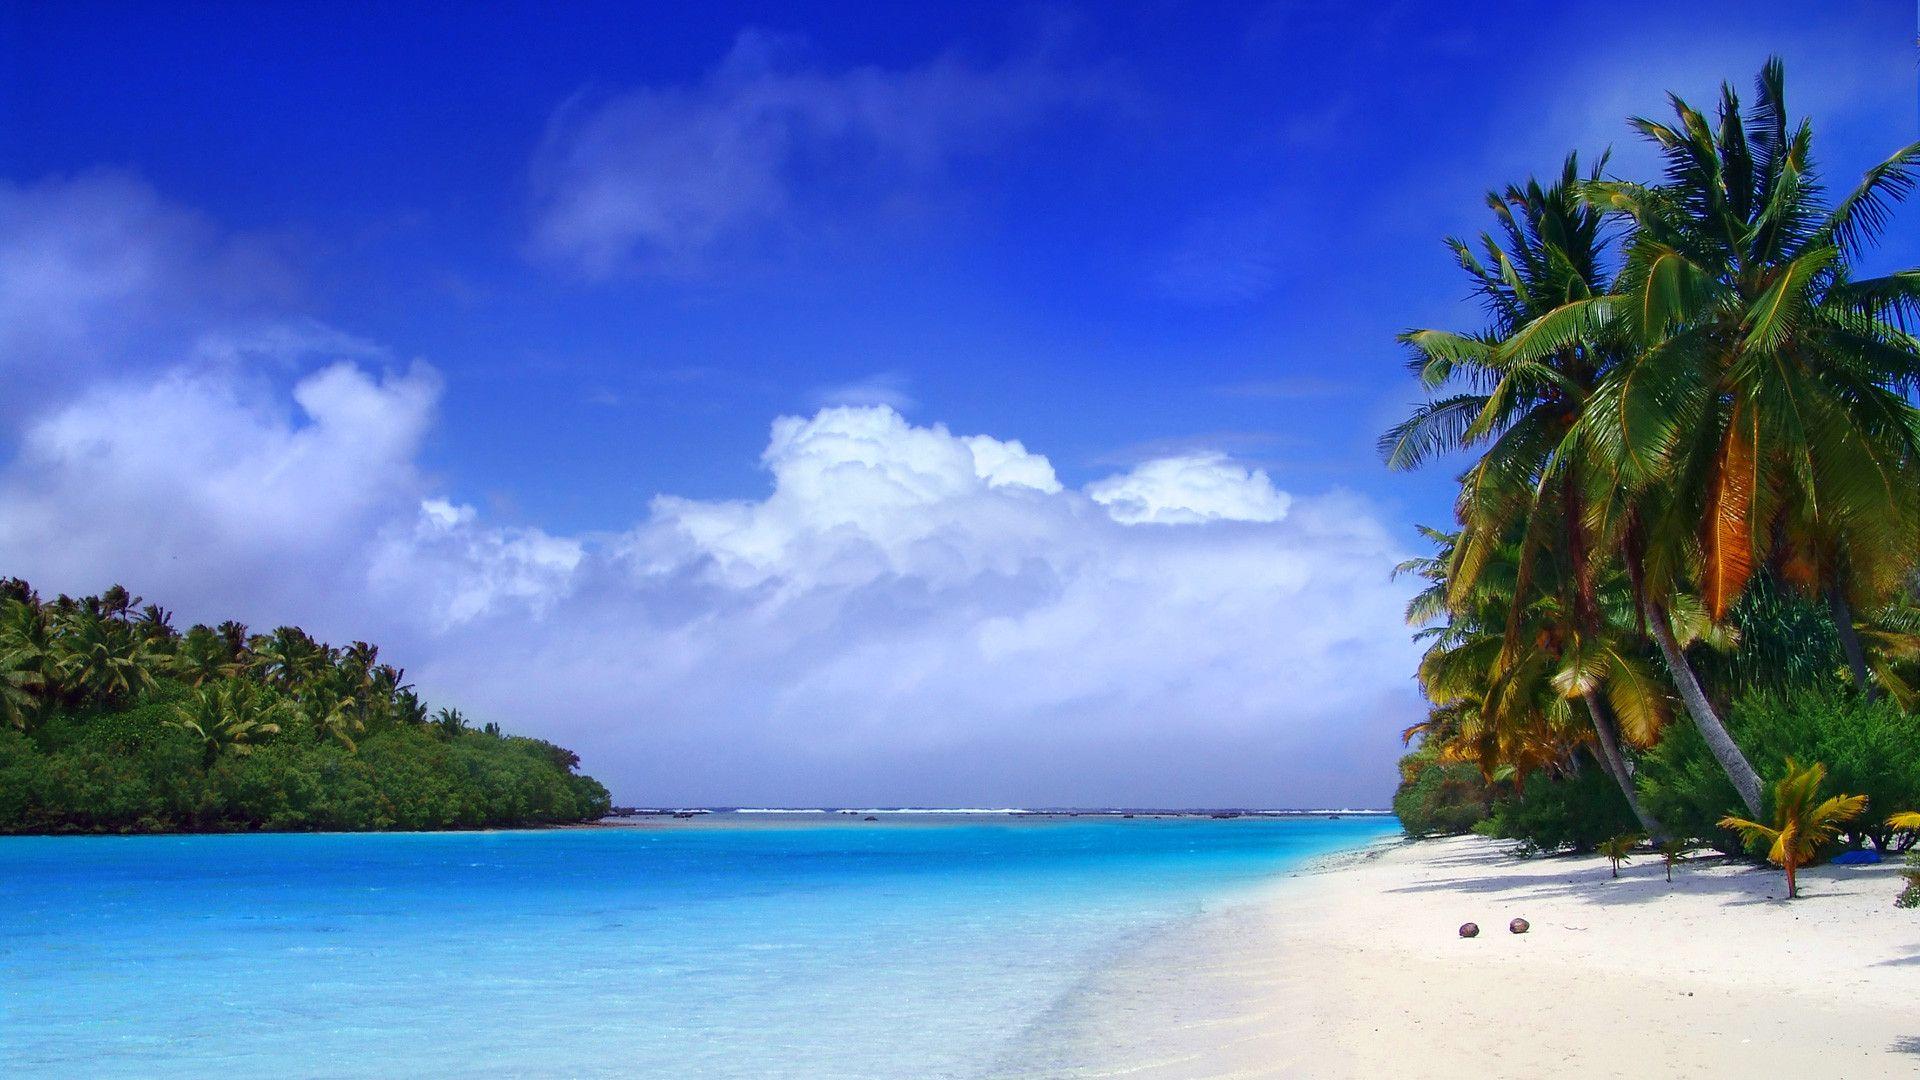 Download Caribbean Beach Wallpaper 1920x1080 HD Wallpapers   569057 1920x1080